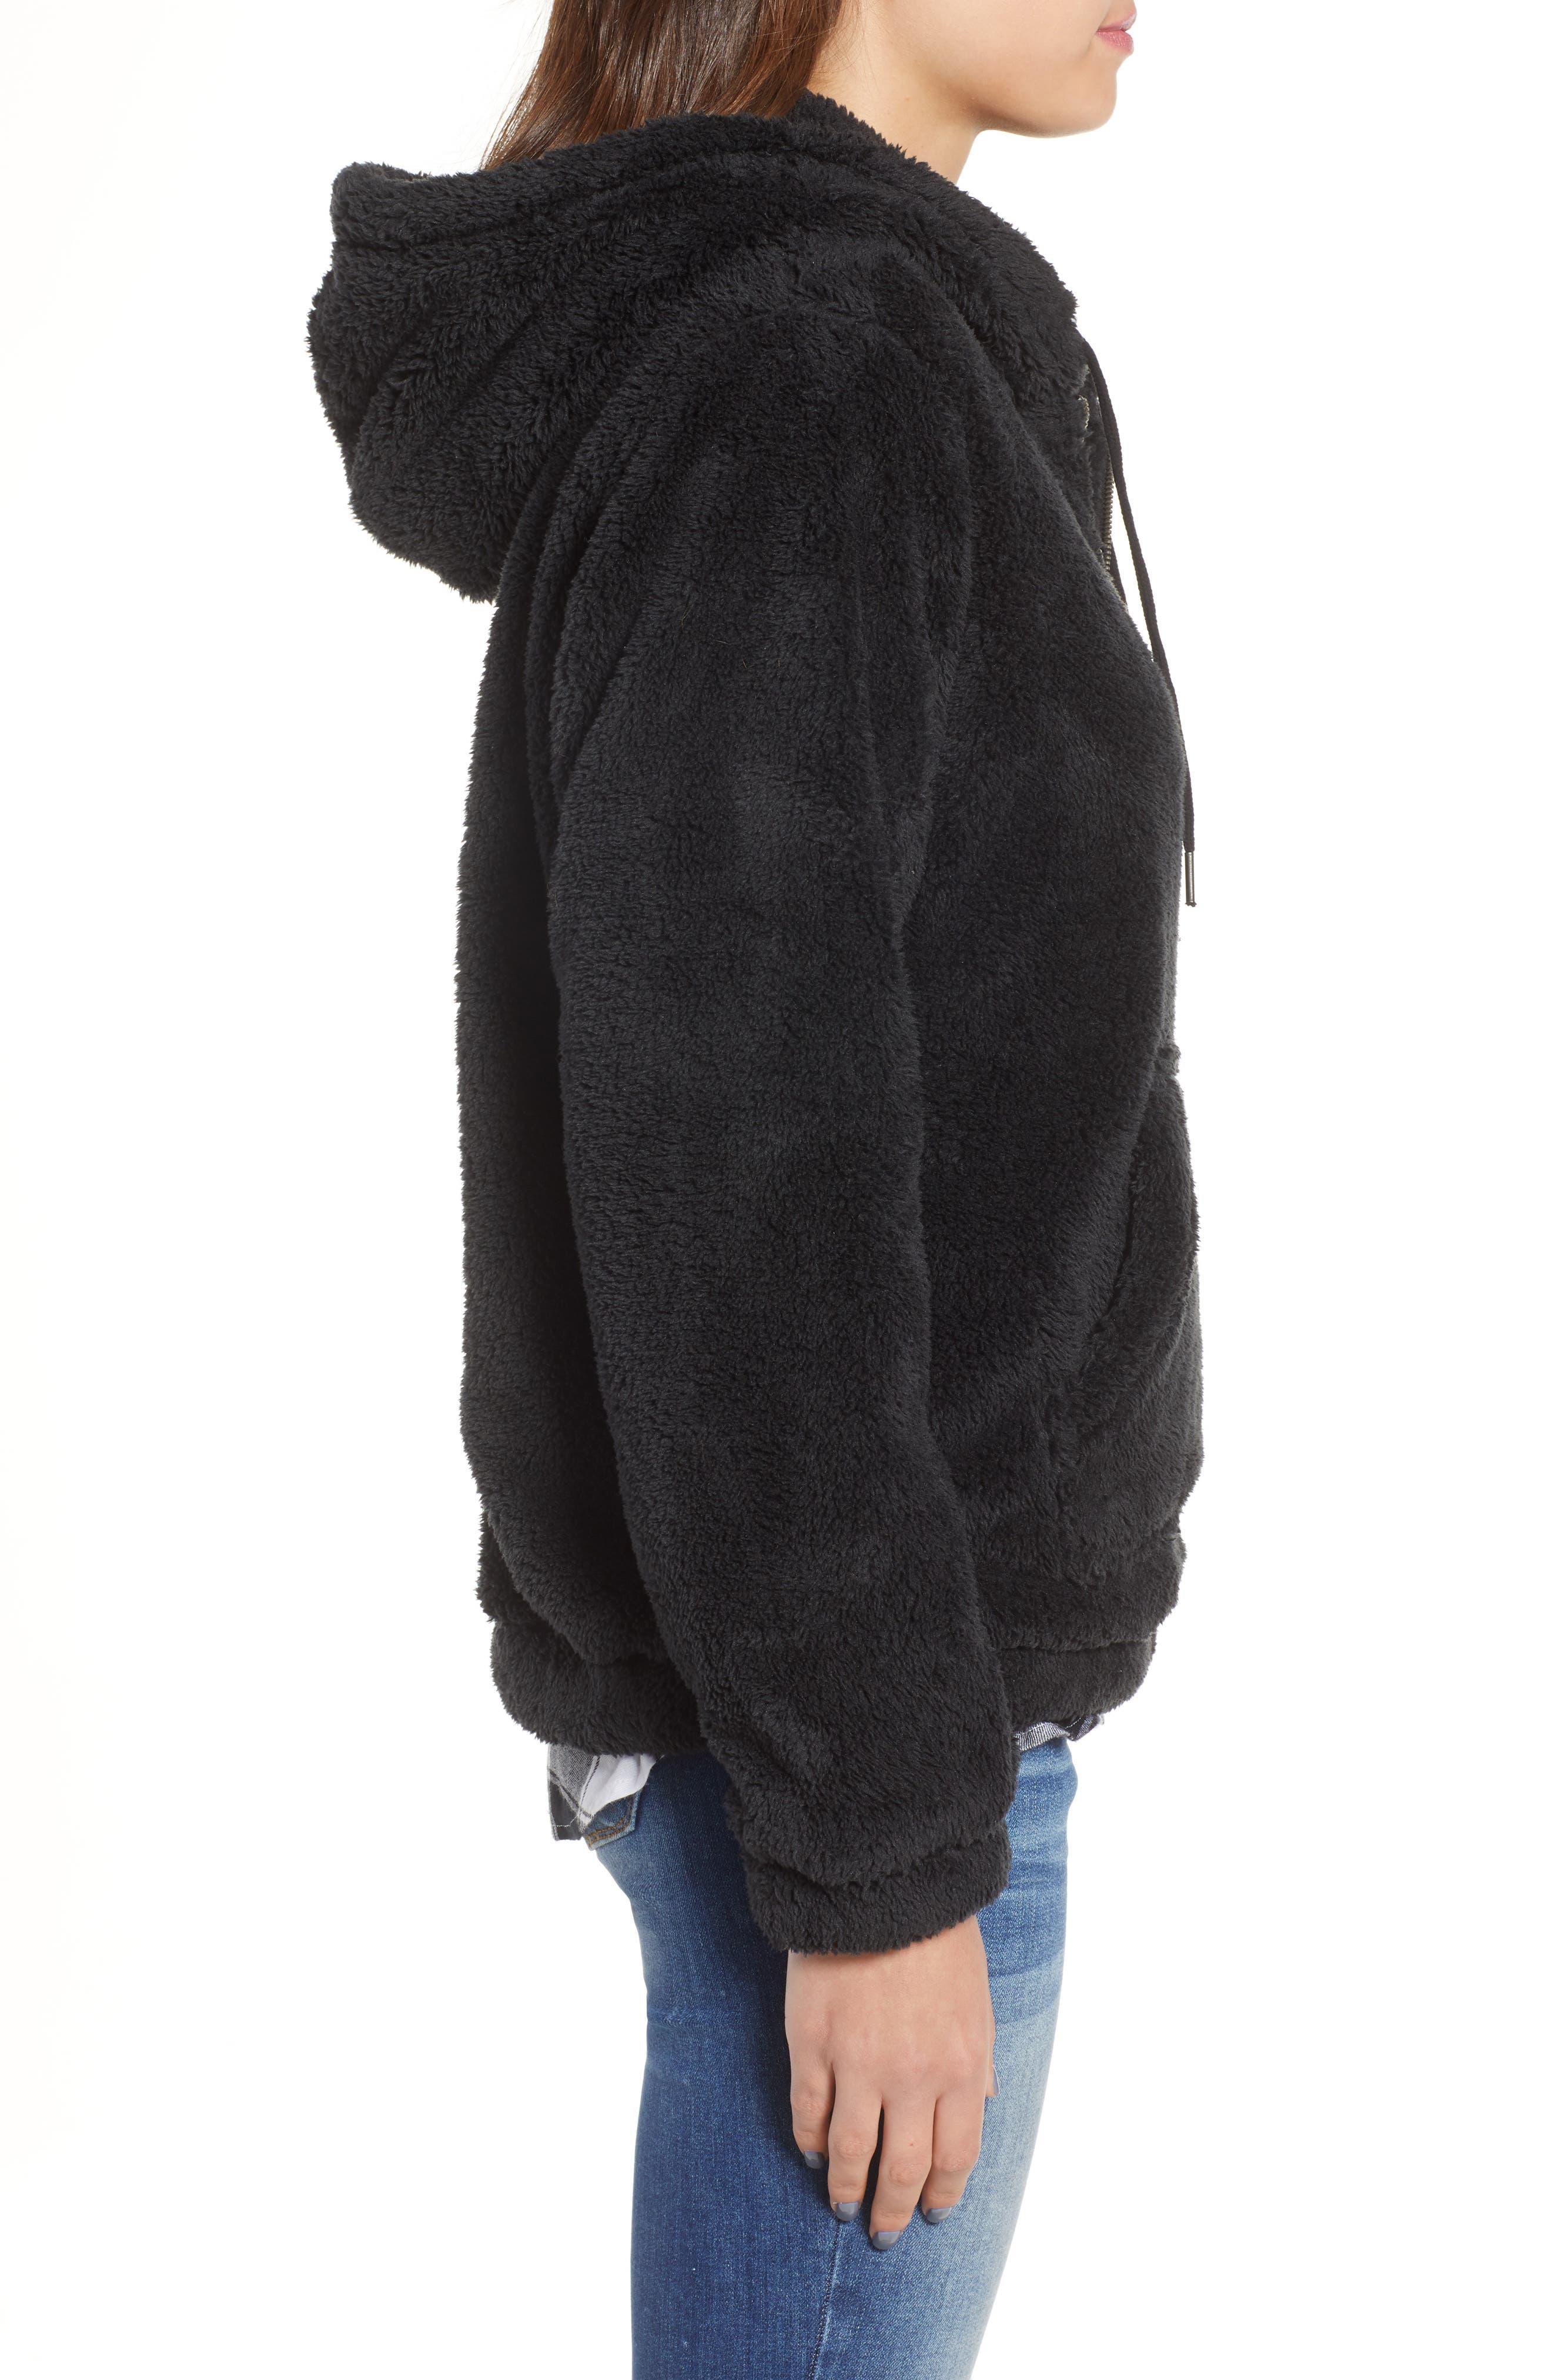 BILLABONG, Cozy For Keeps Fleece Pullover, Alternate thumbnail 4, color, 001